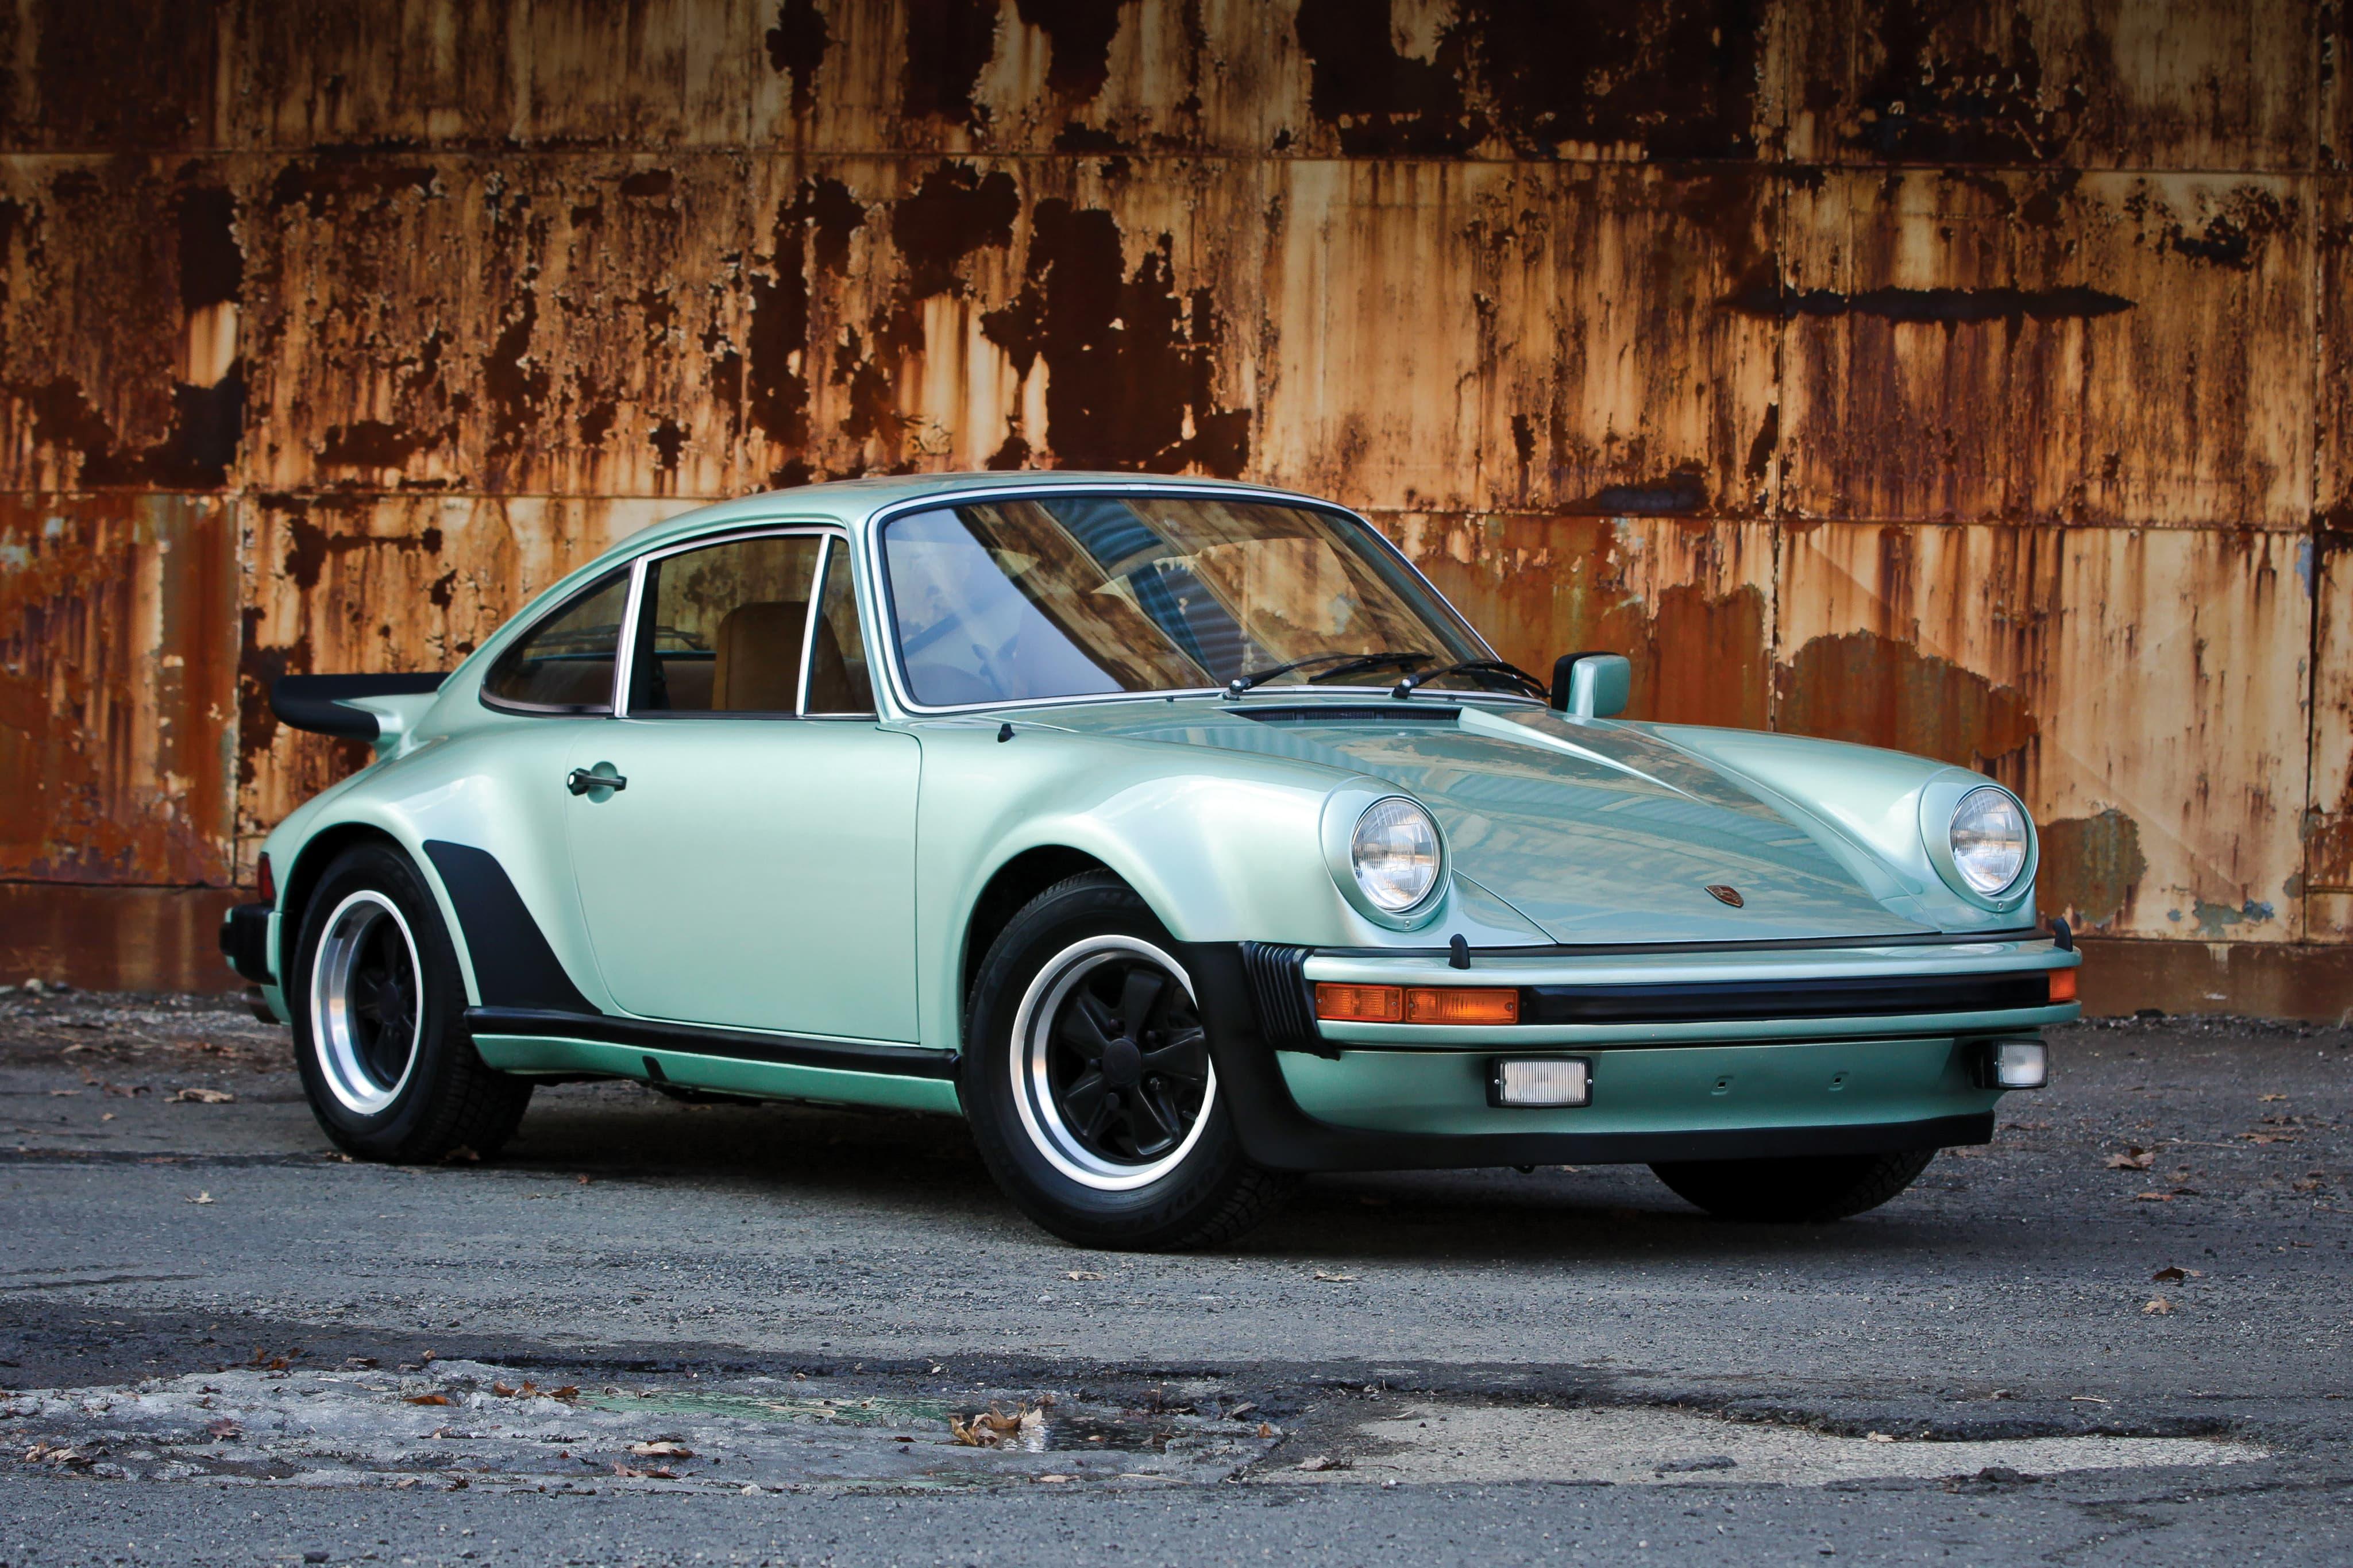 1976 Porsche 911 Turbo 930 Hd Wallpapers 7wallpapers Net